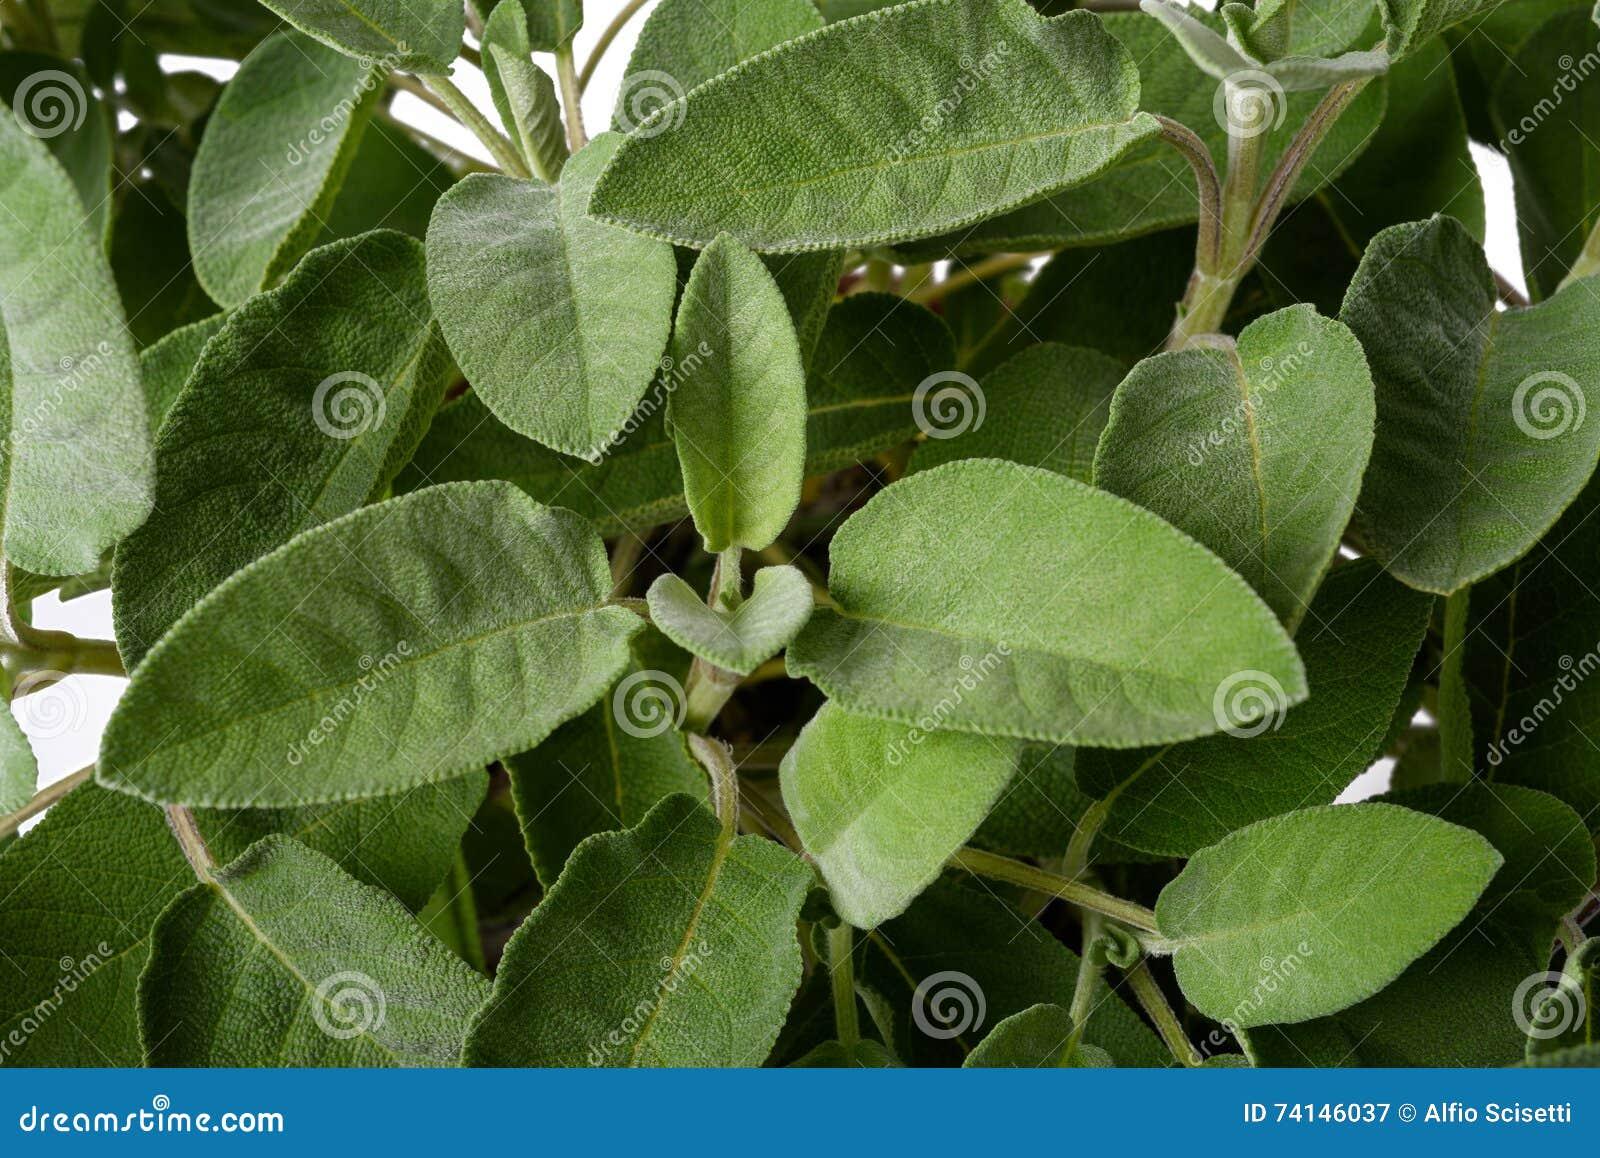 Sage plants background